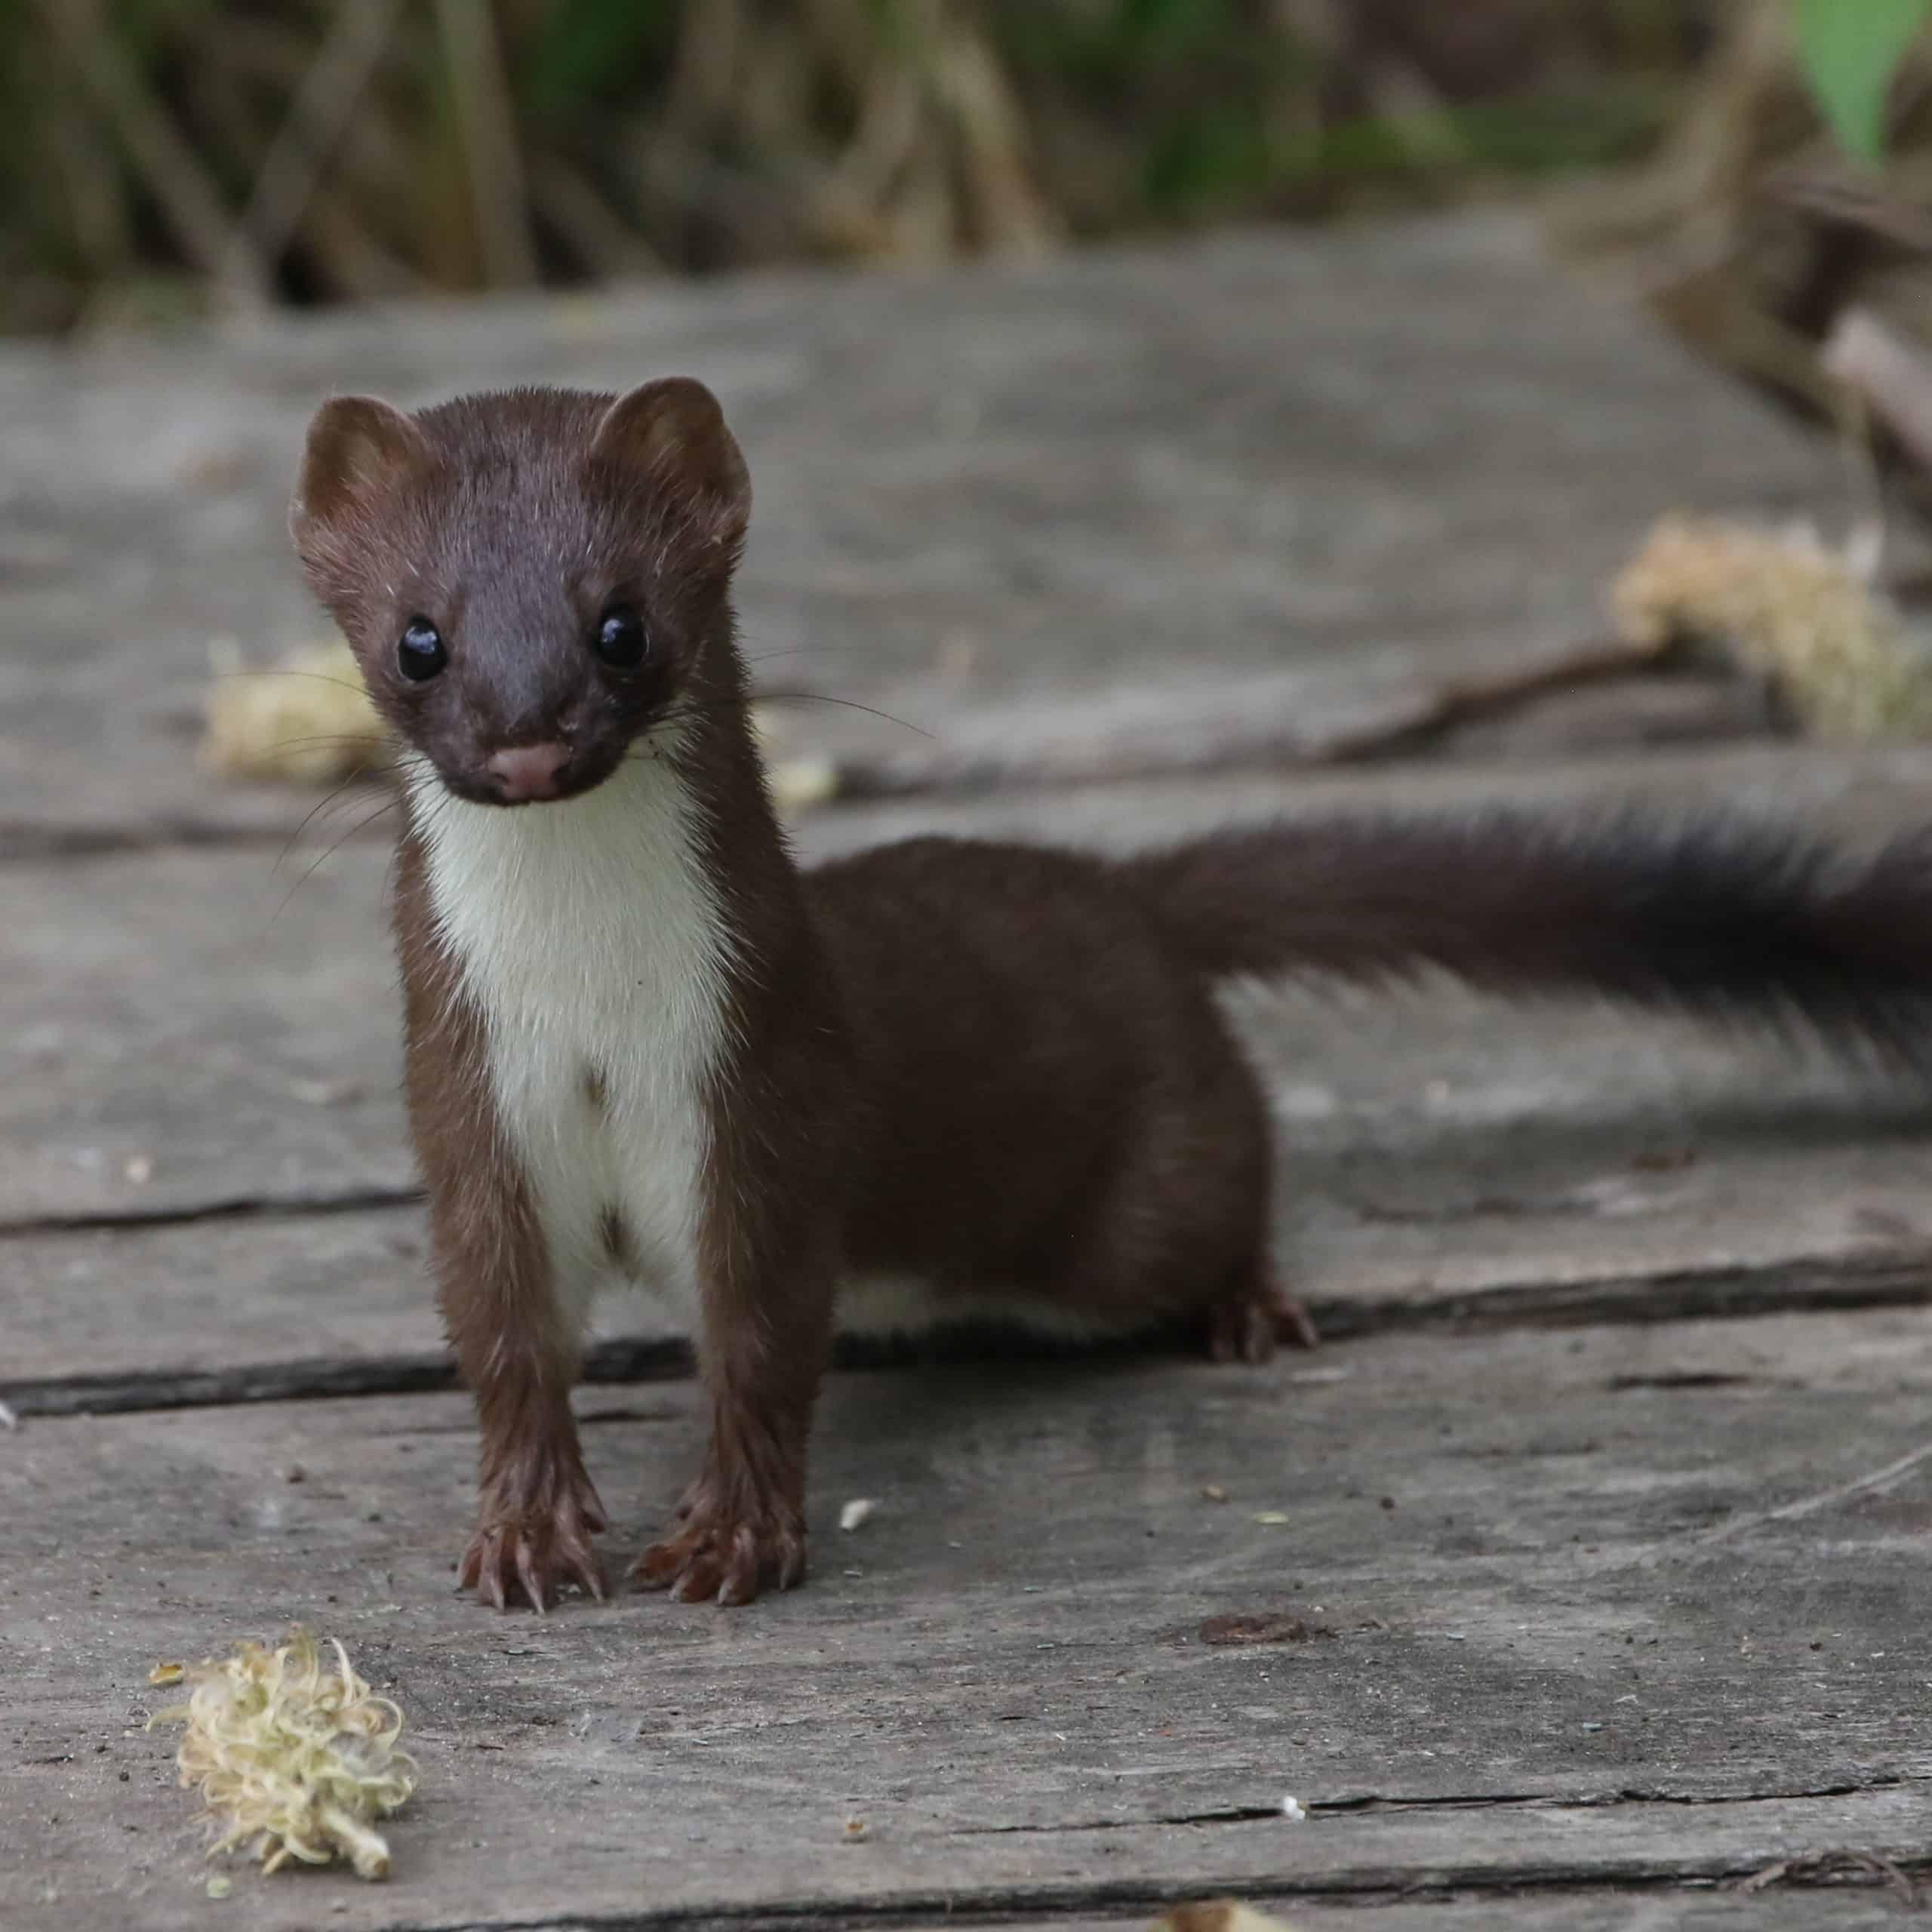 long tailed weasel mustela frenata encounter on burma trail foot bridge